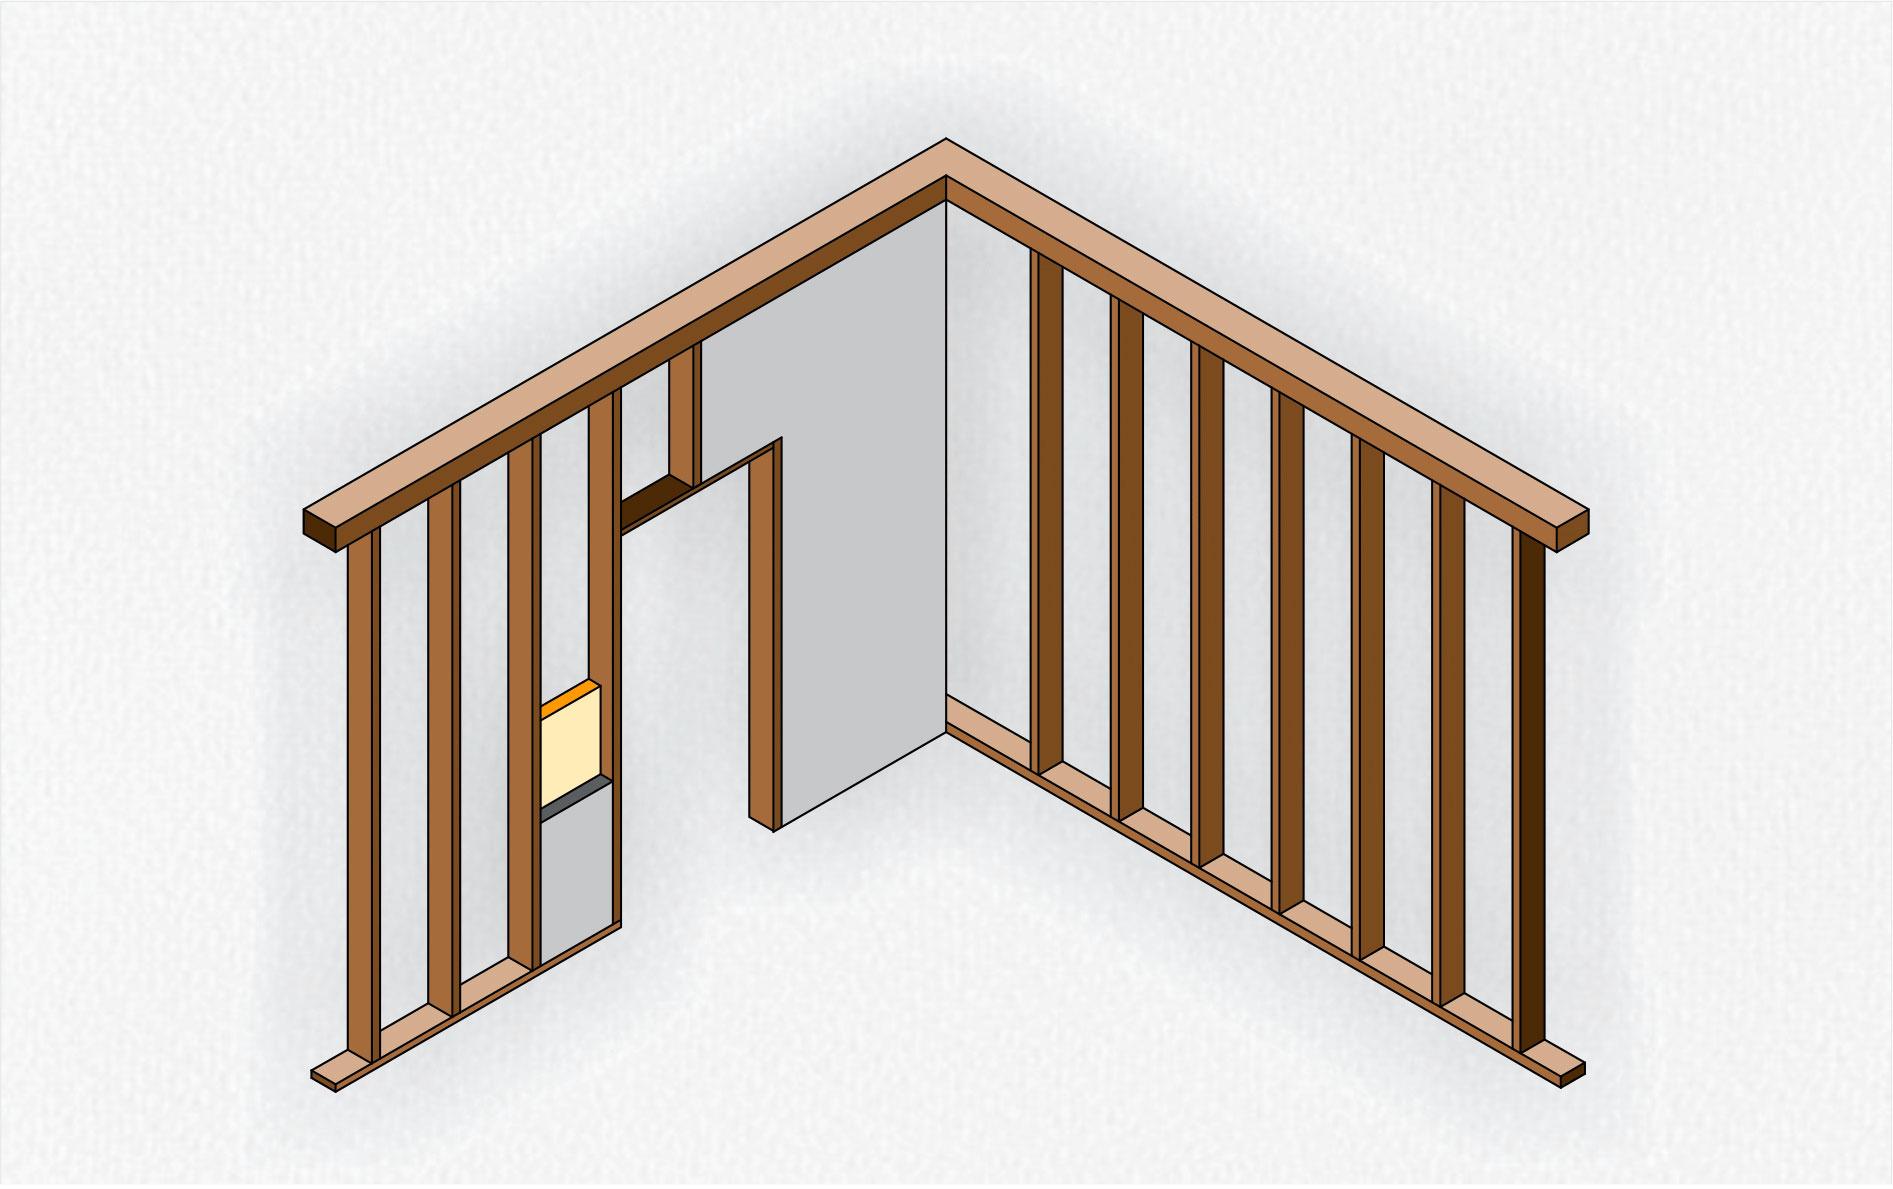 sistema constructivo wood frame